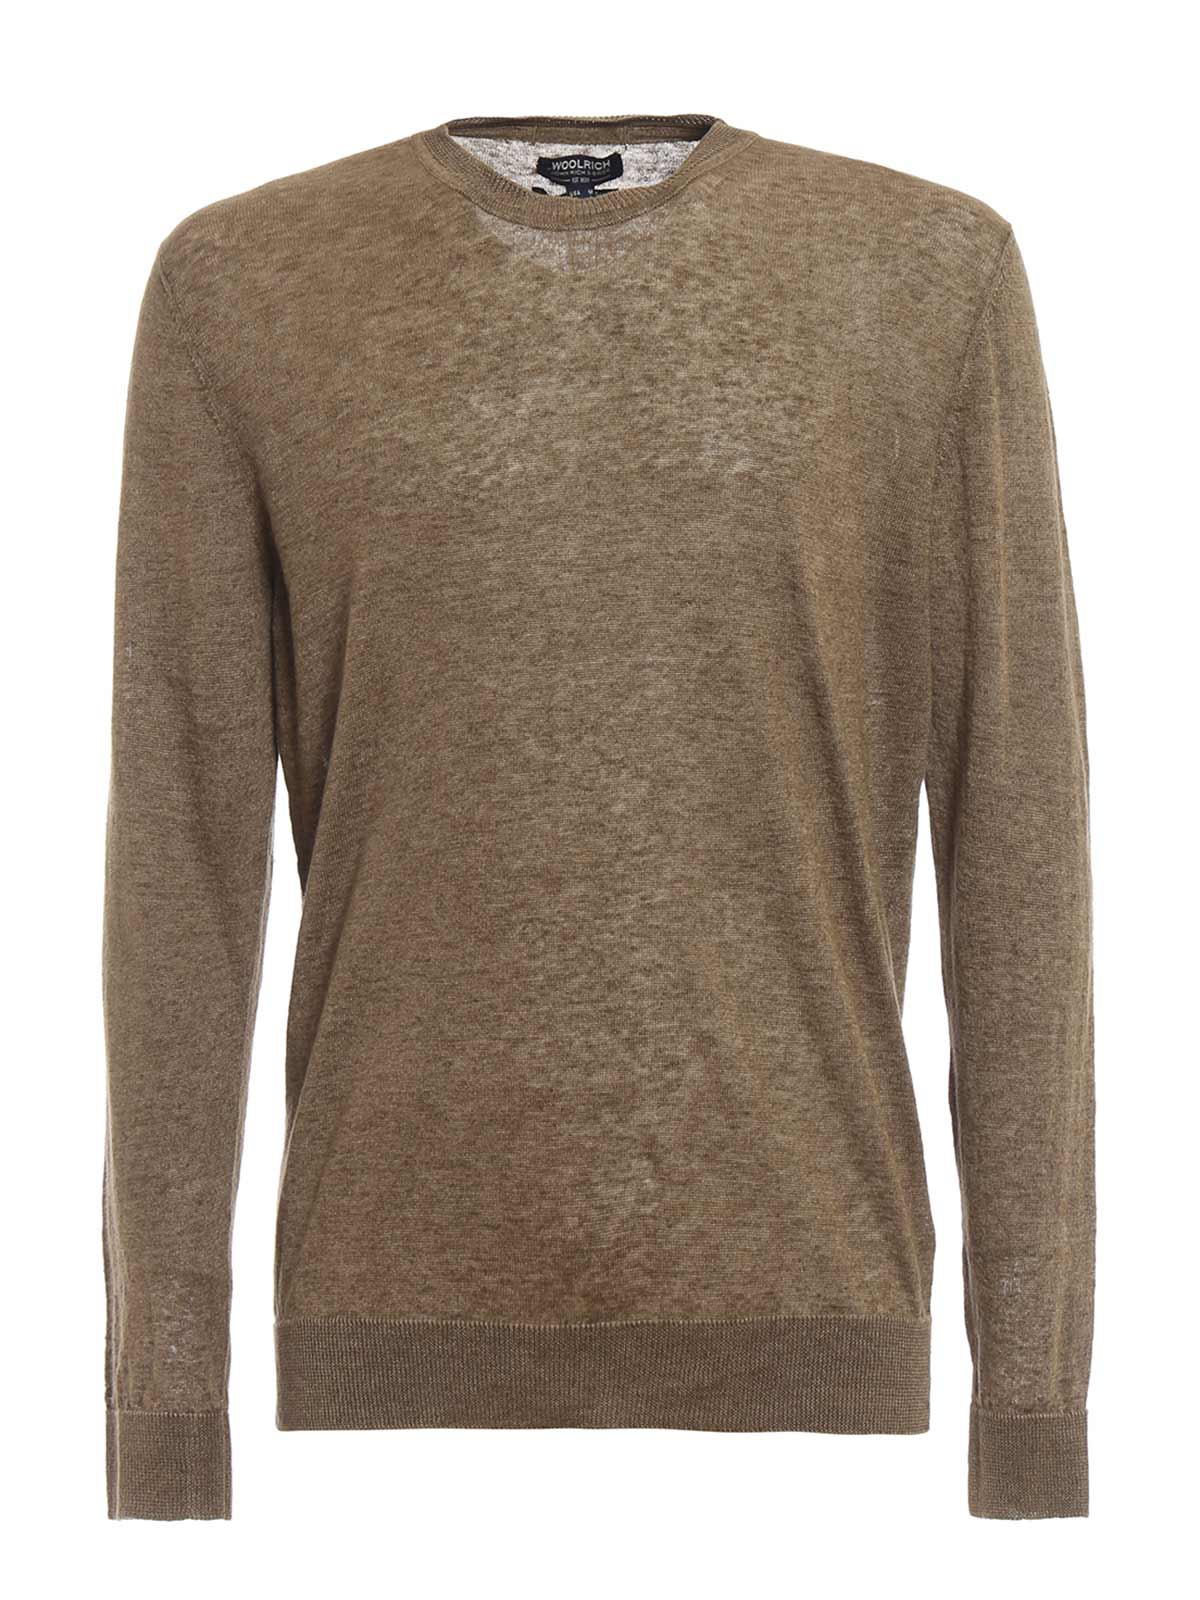 Picture of WOOLRICH | Men's Linen Crewneck Sweater